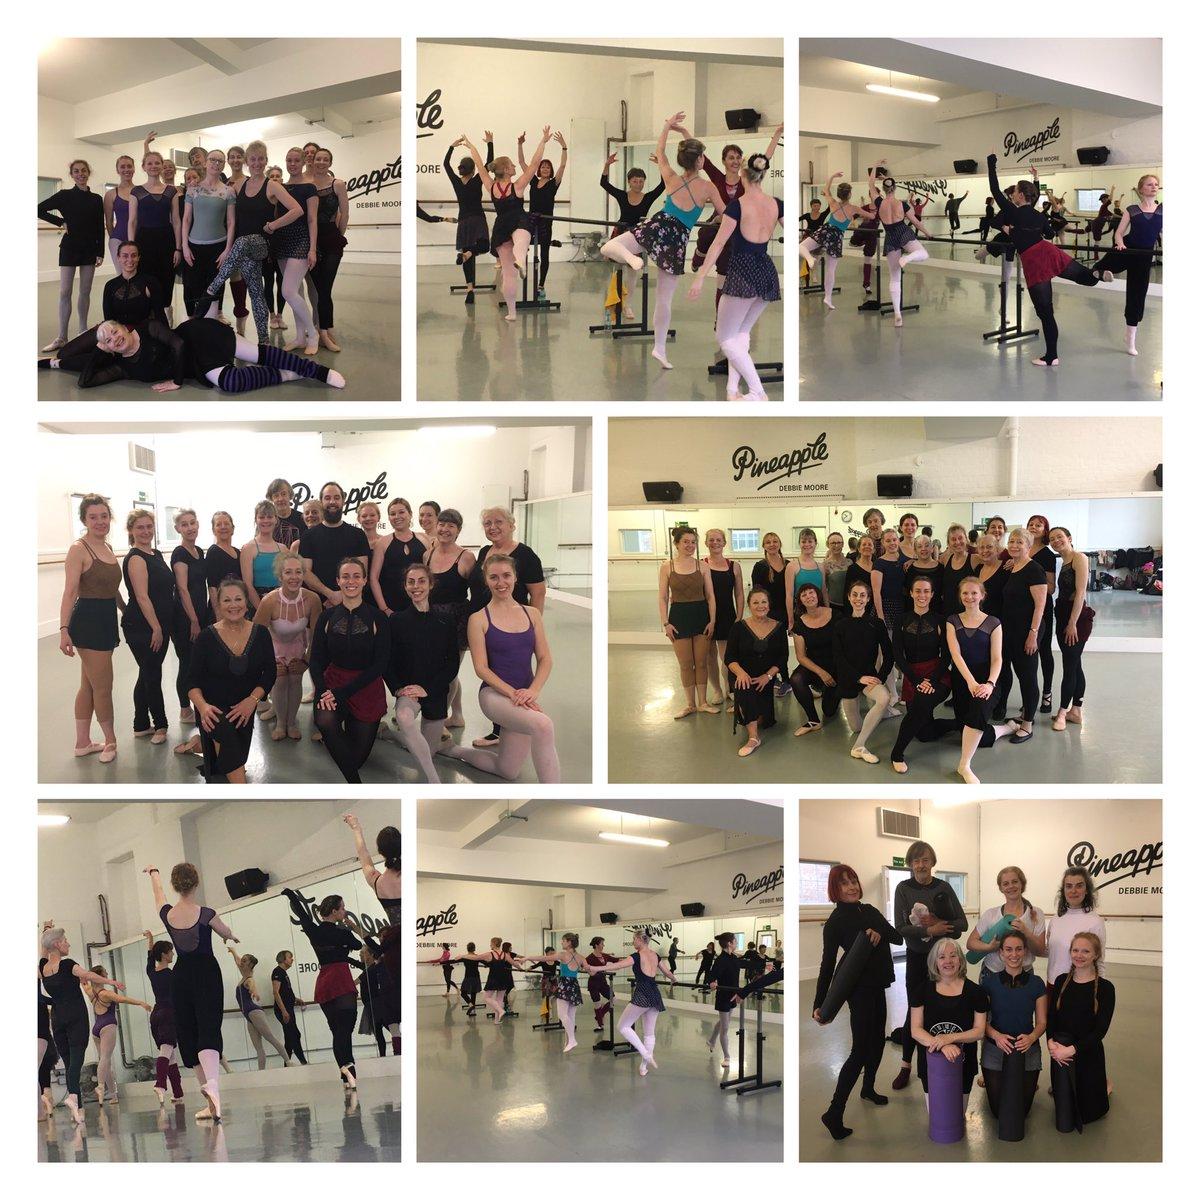 A great day at the Chelsea Ballet Winter Workshop. #ChelseaBallet #AdultBallet pic.twitter.com/gTsvLW2VuM